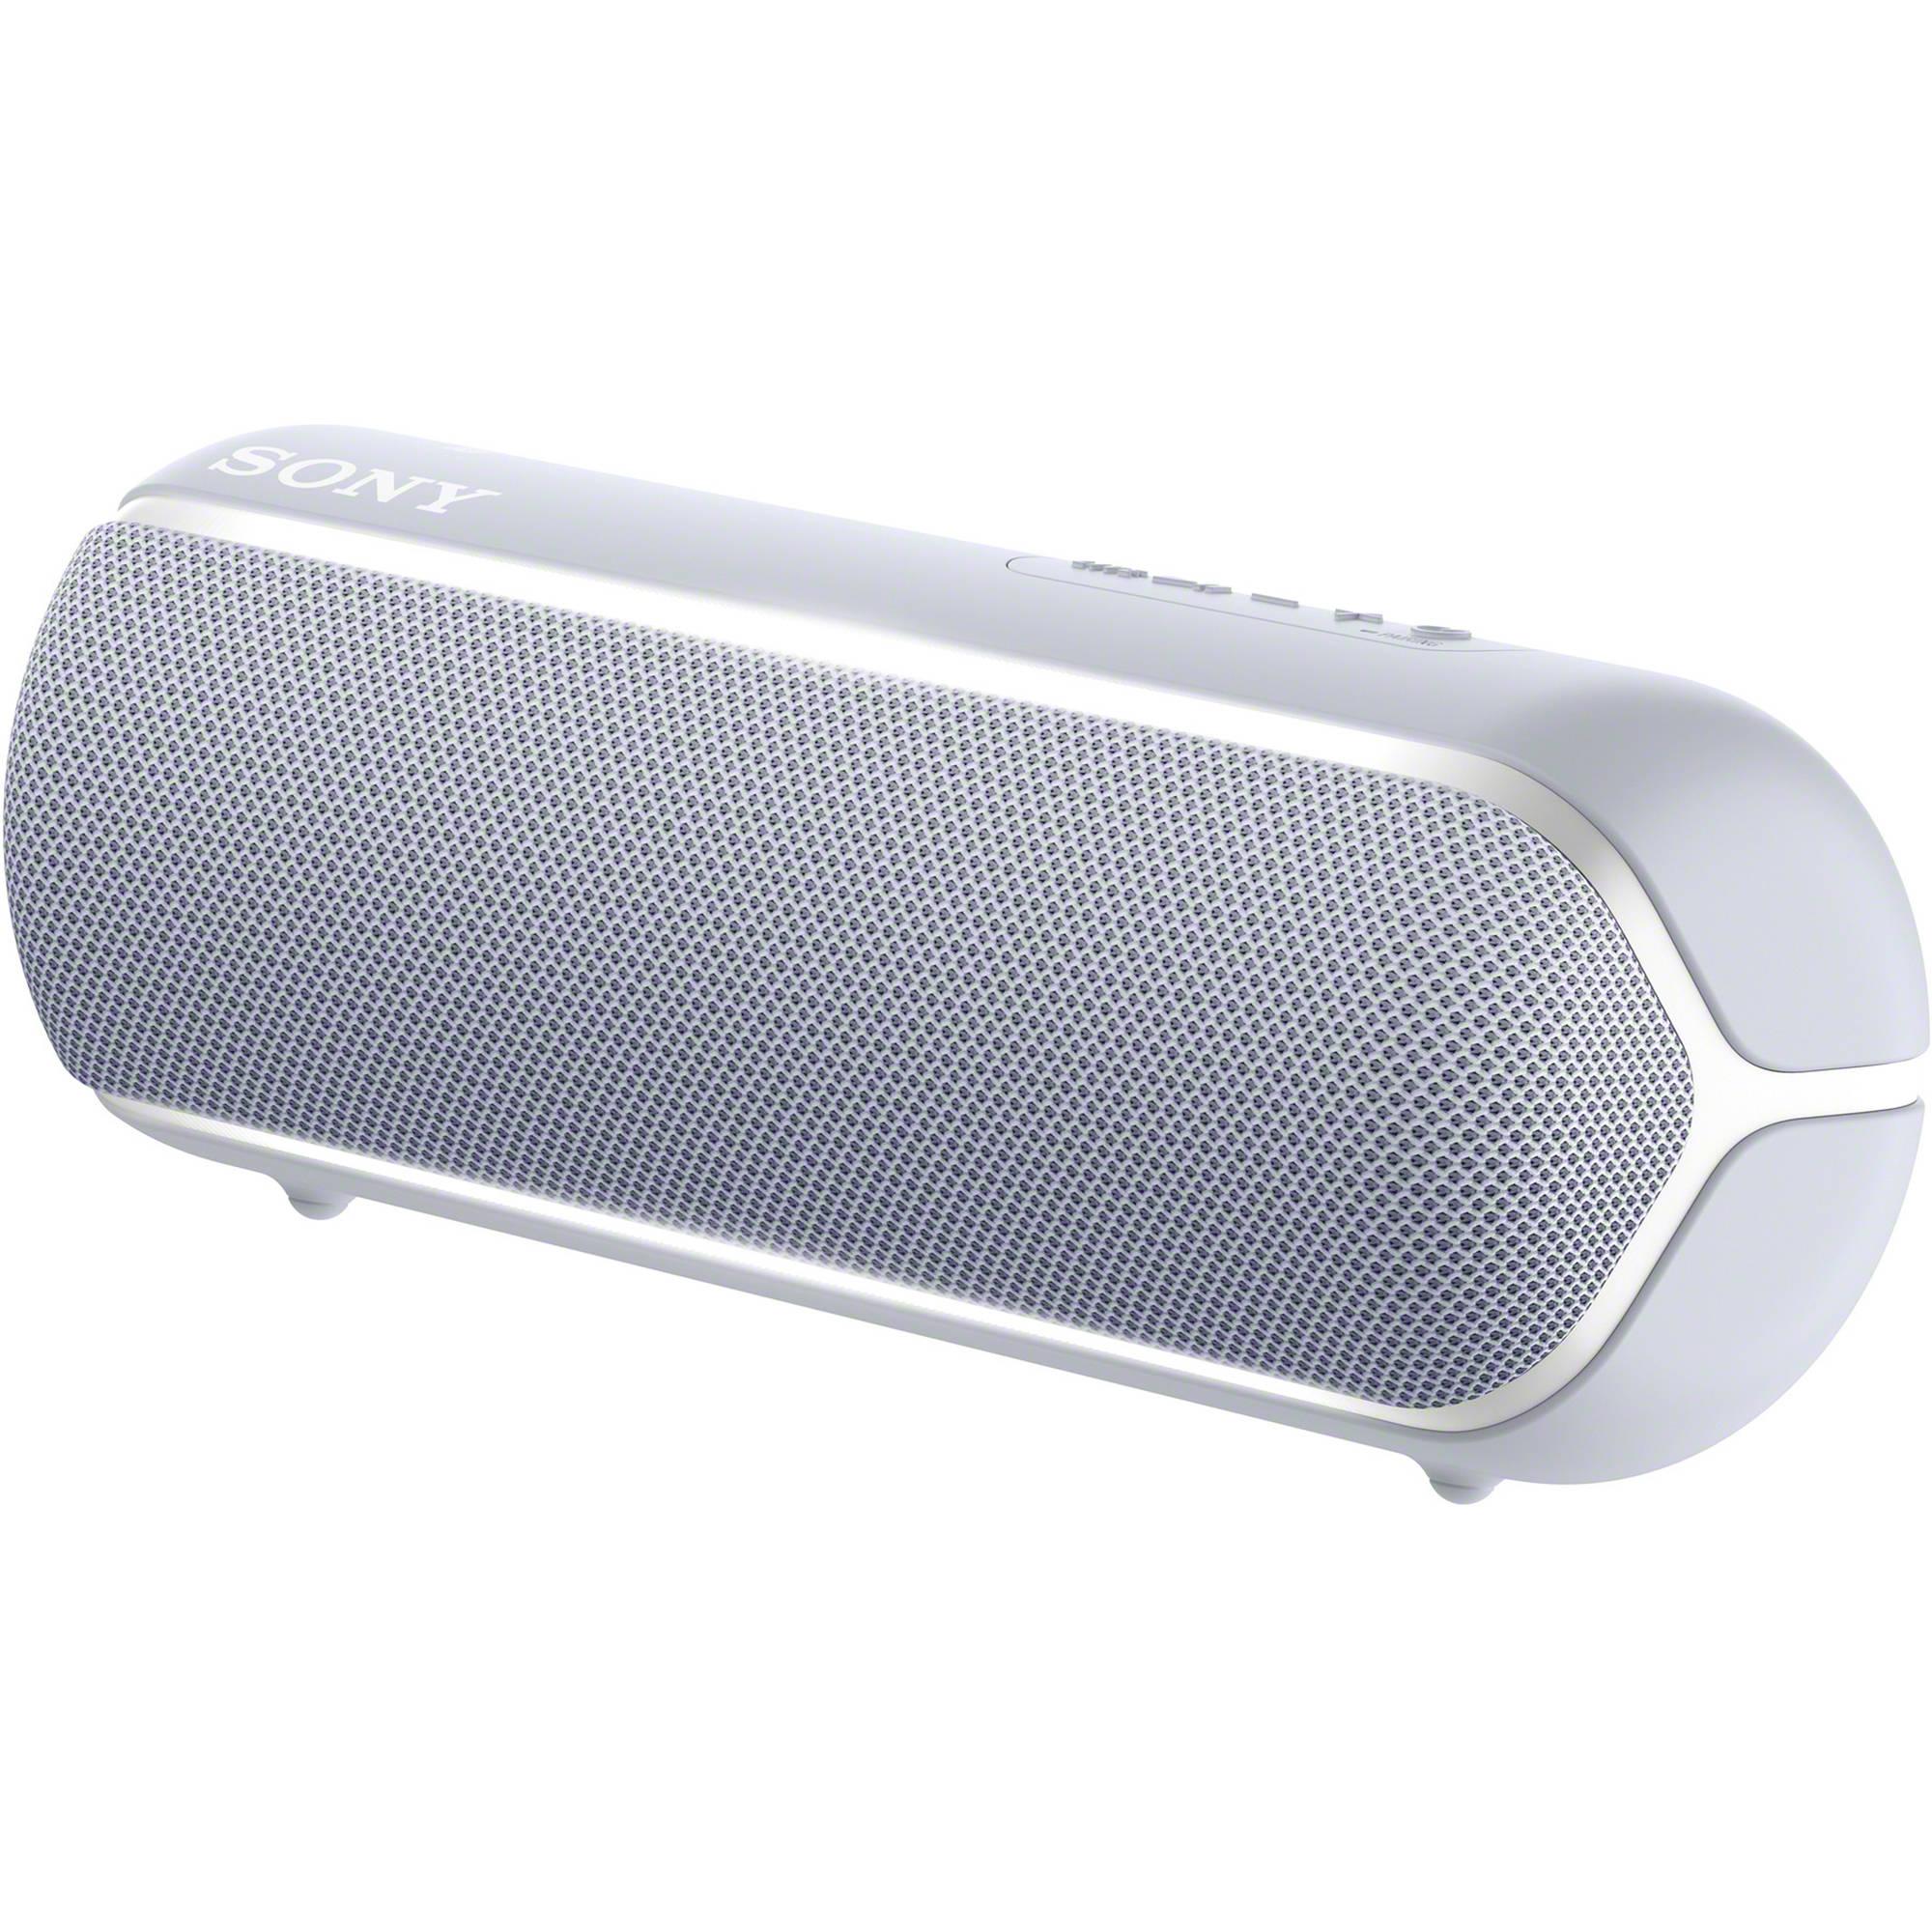 Sony Xb22 Extra Bass Portable Bluetooth Speaker Gray Srsxb22 H